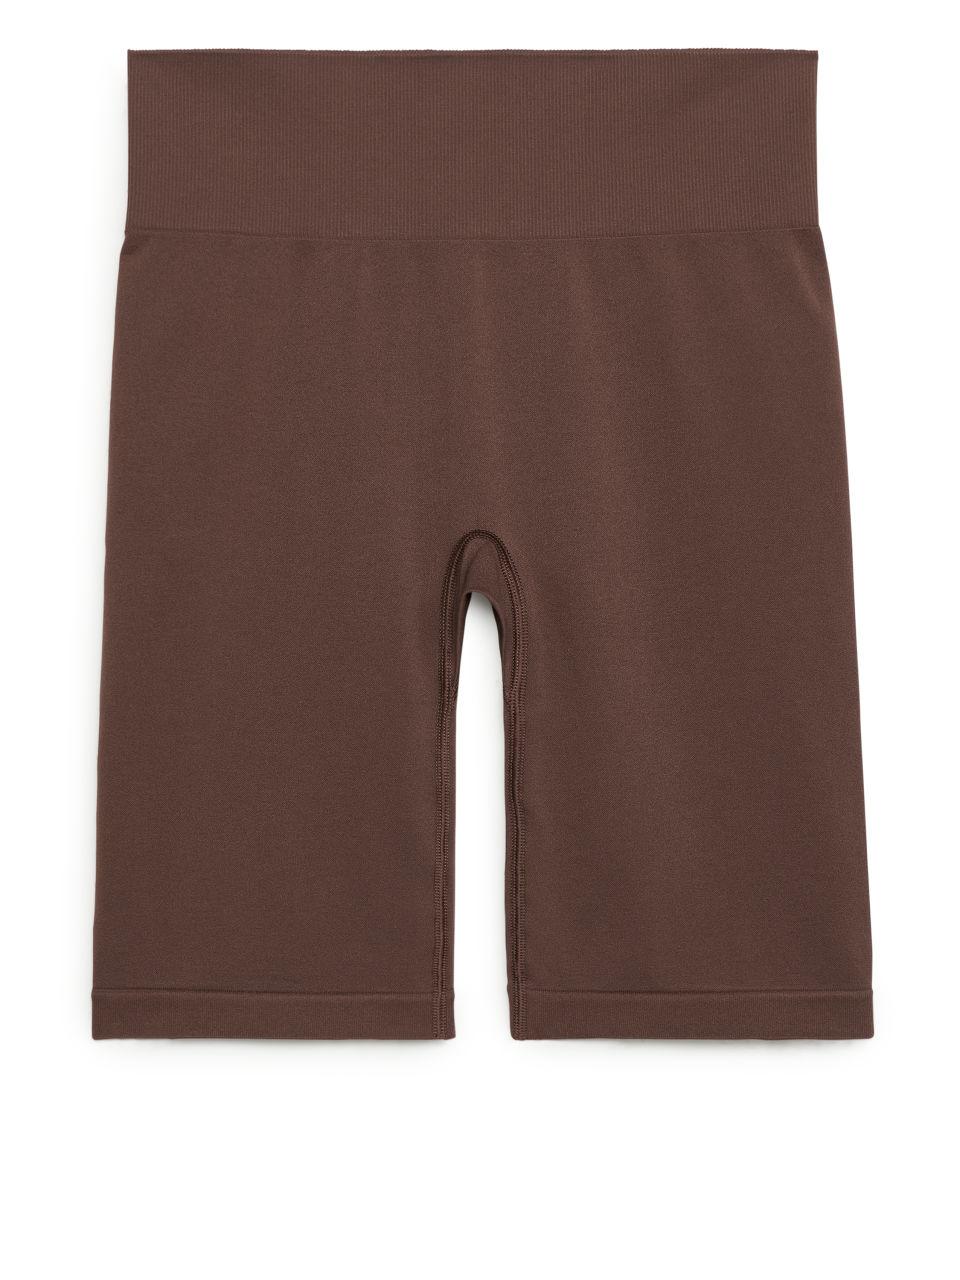 Seamless™ Yoga Shorts - Brown